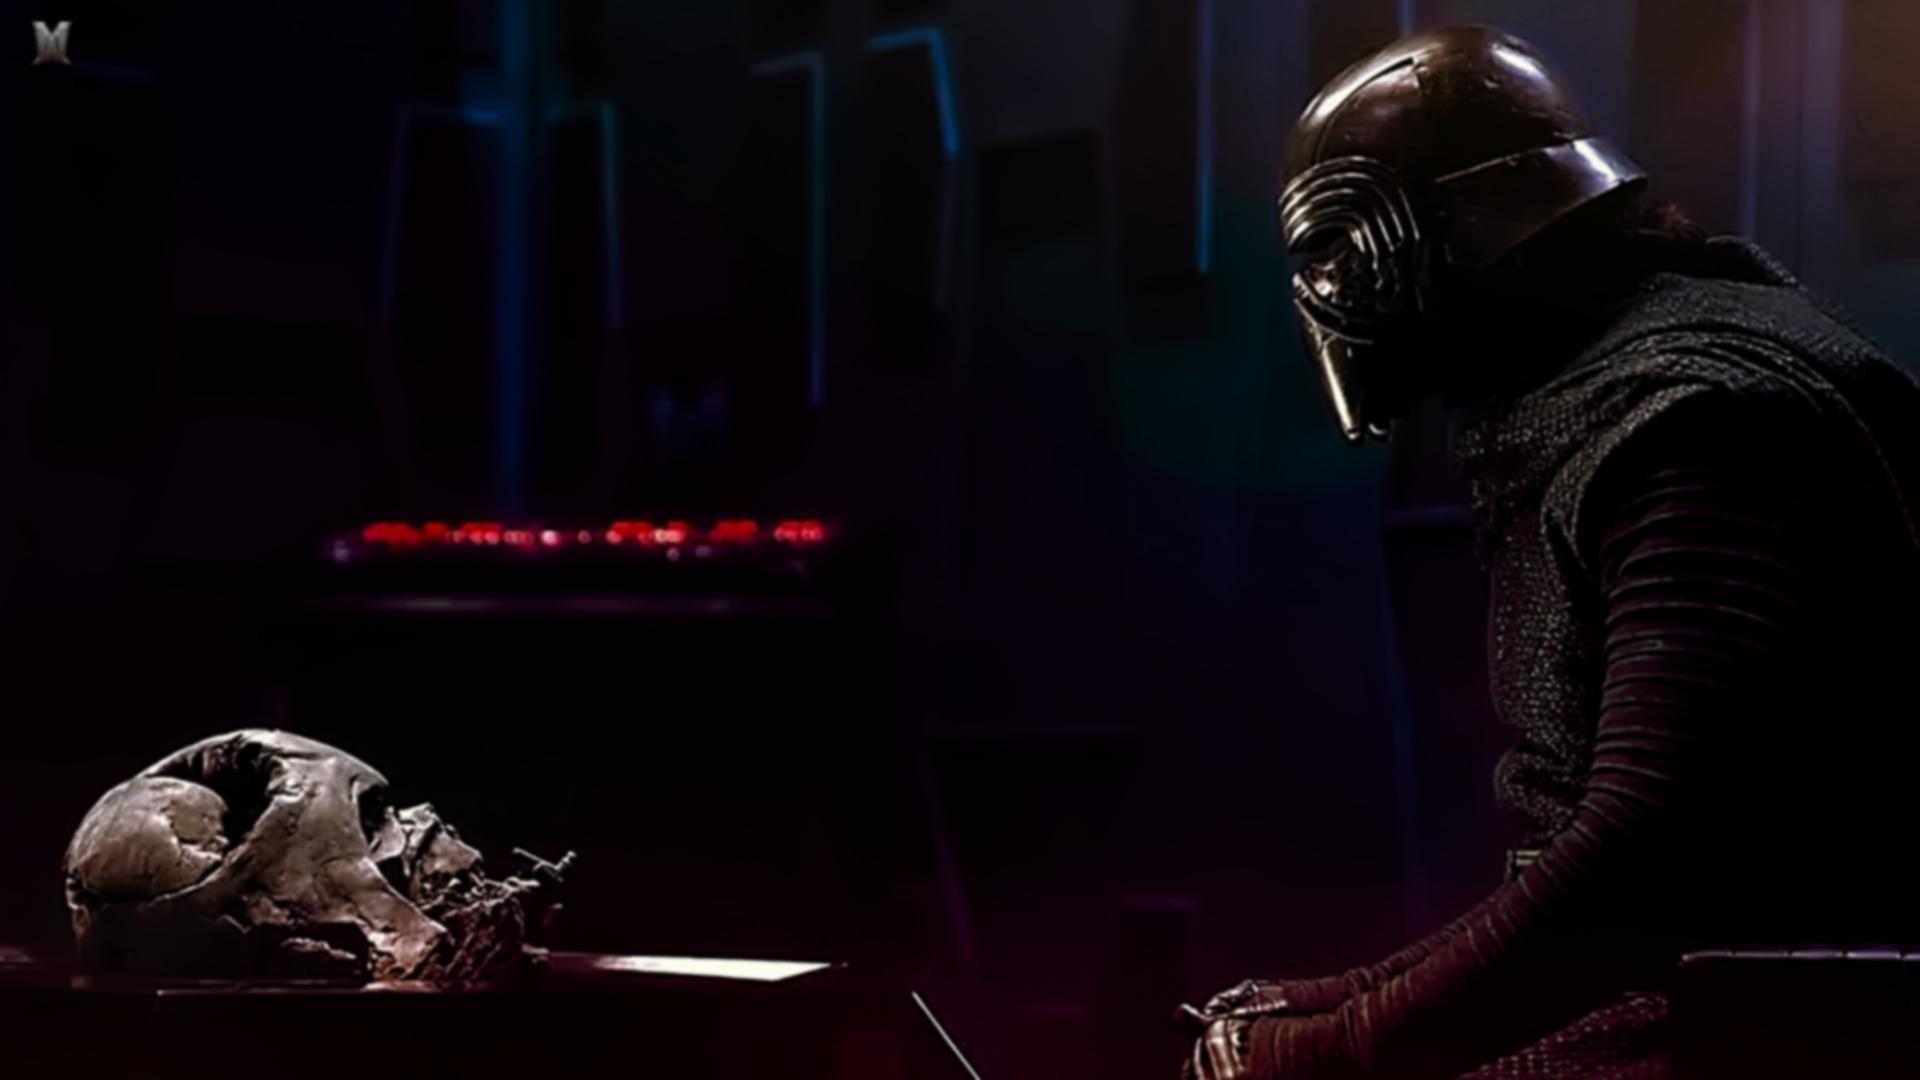 Wallpaper Teach Me The Dark Side Star Wars Ep7 By Tobimoyd On Deviantart